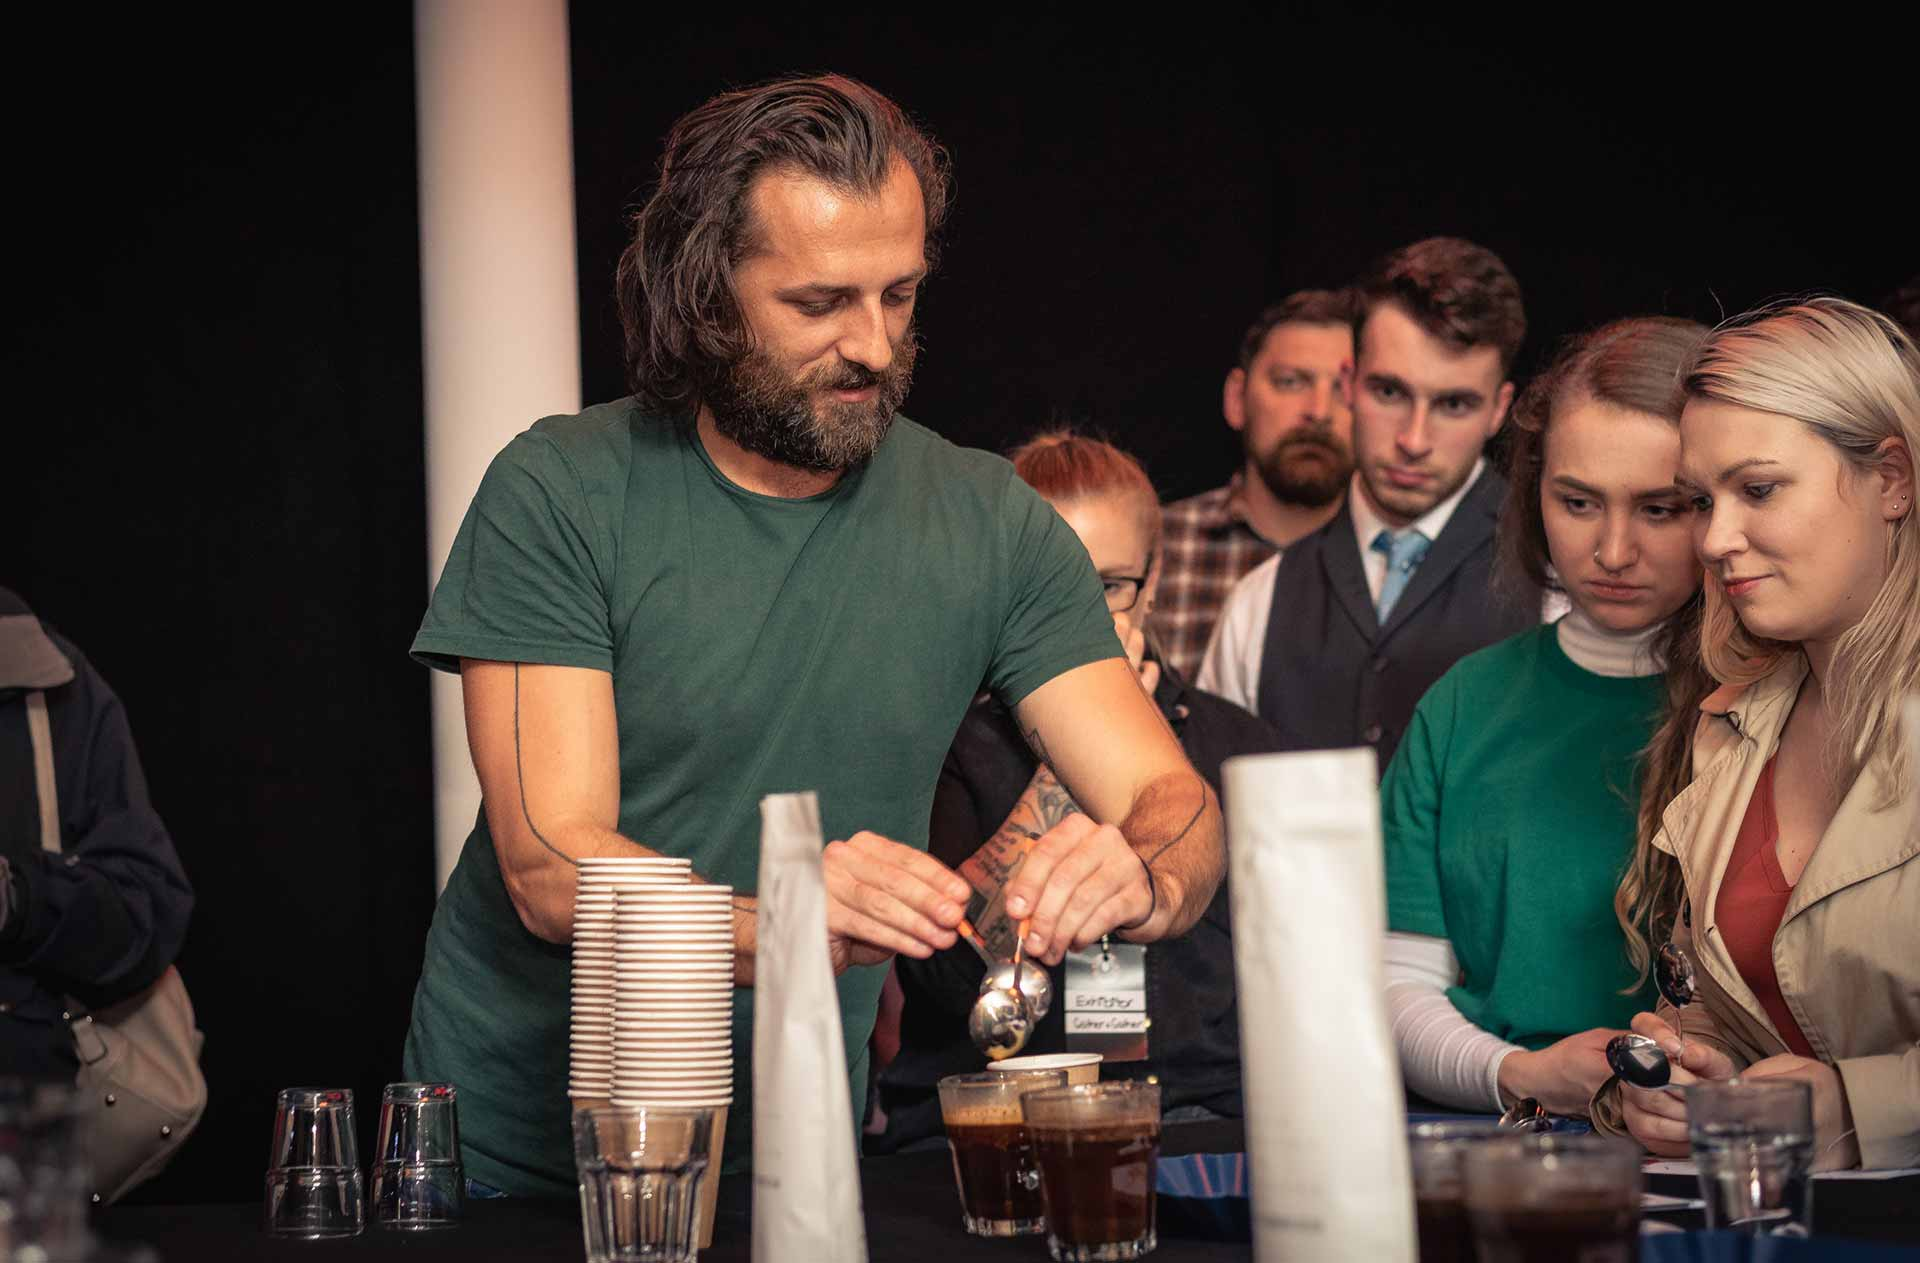 Kaffee-Events, Festival und Kalender: Edinburgh Coffee Festival. CafCaf – Kaffee & Blog, Kaffeeblog